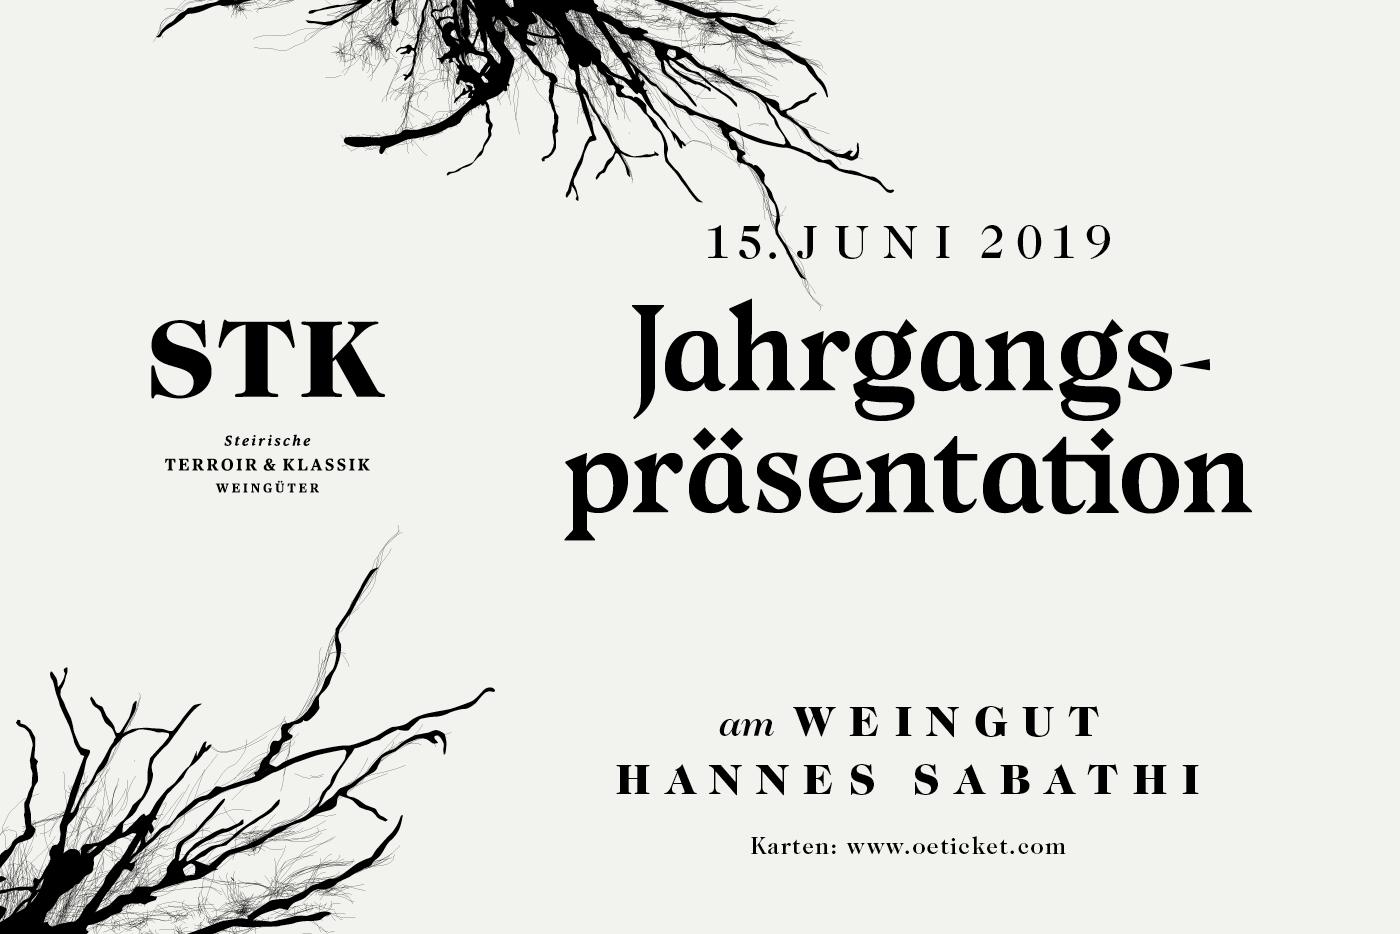 stk_2019_web_bild